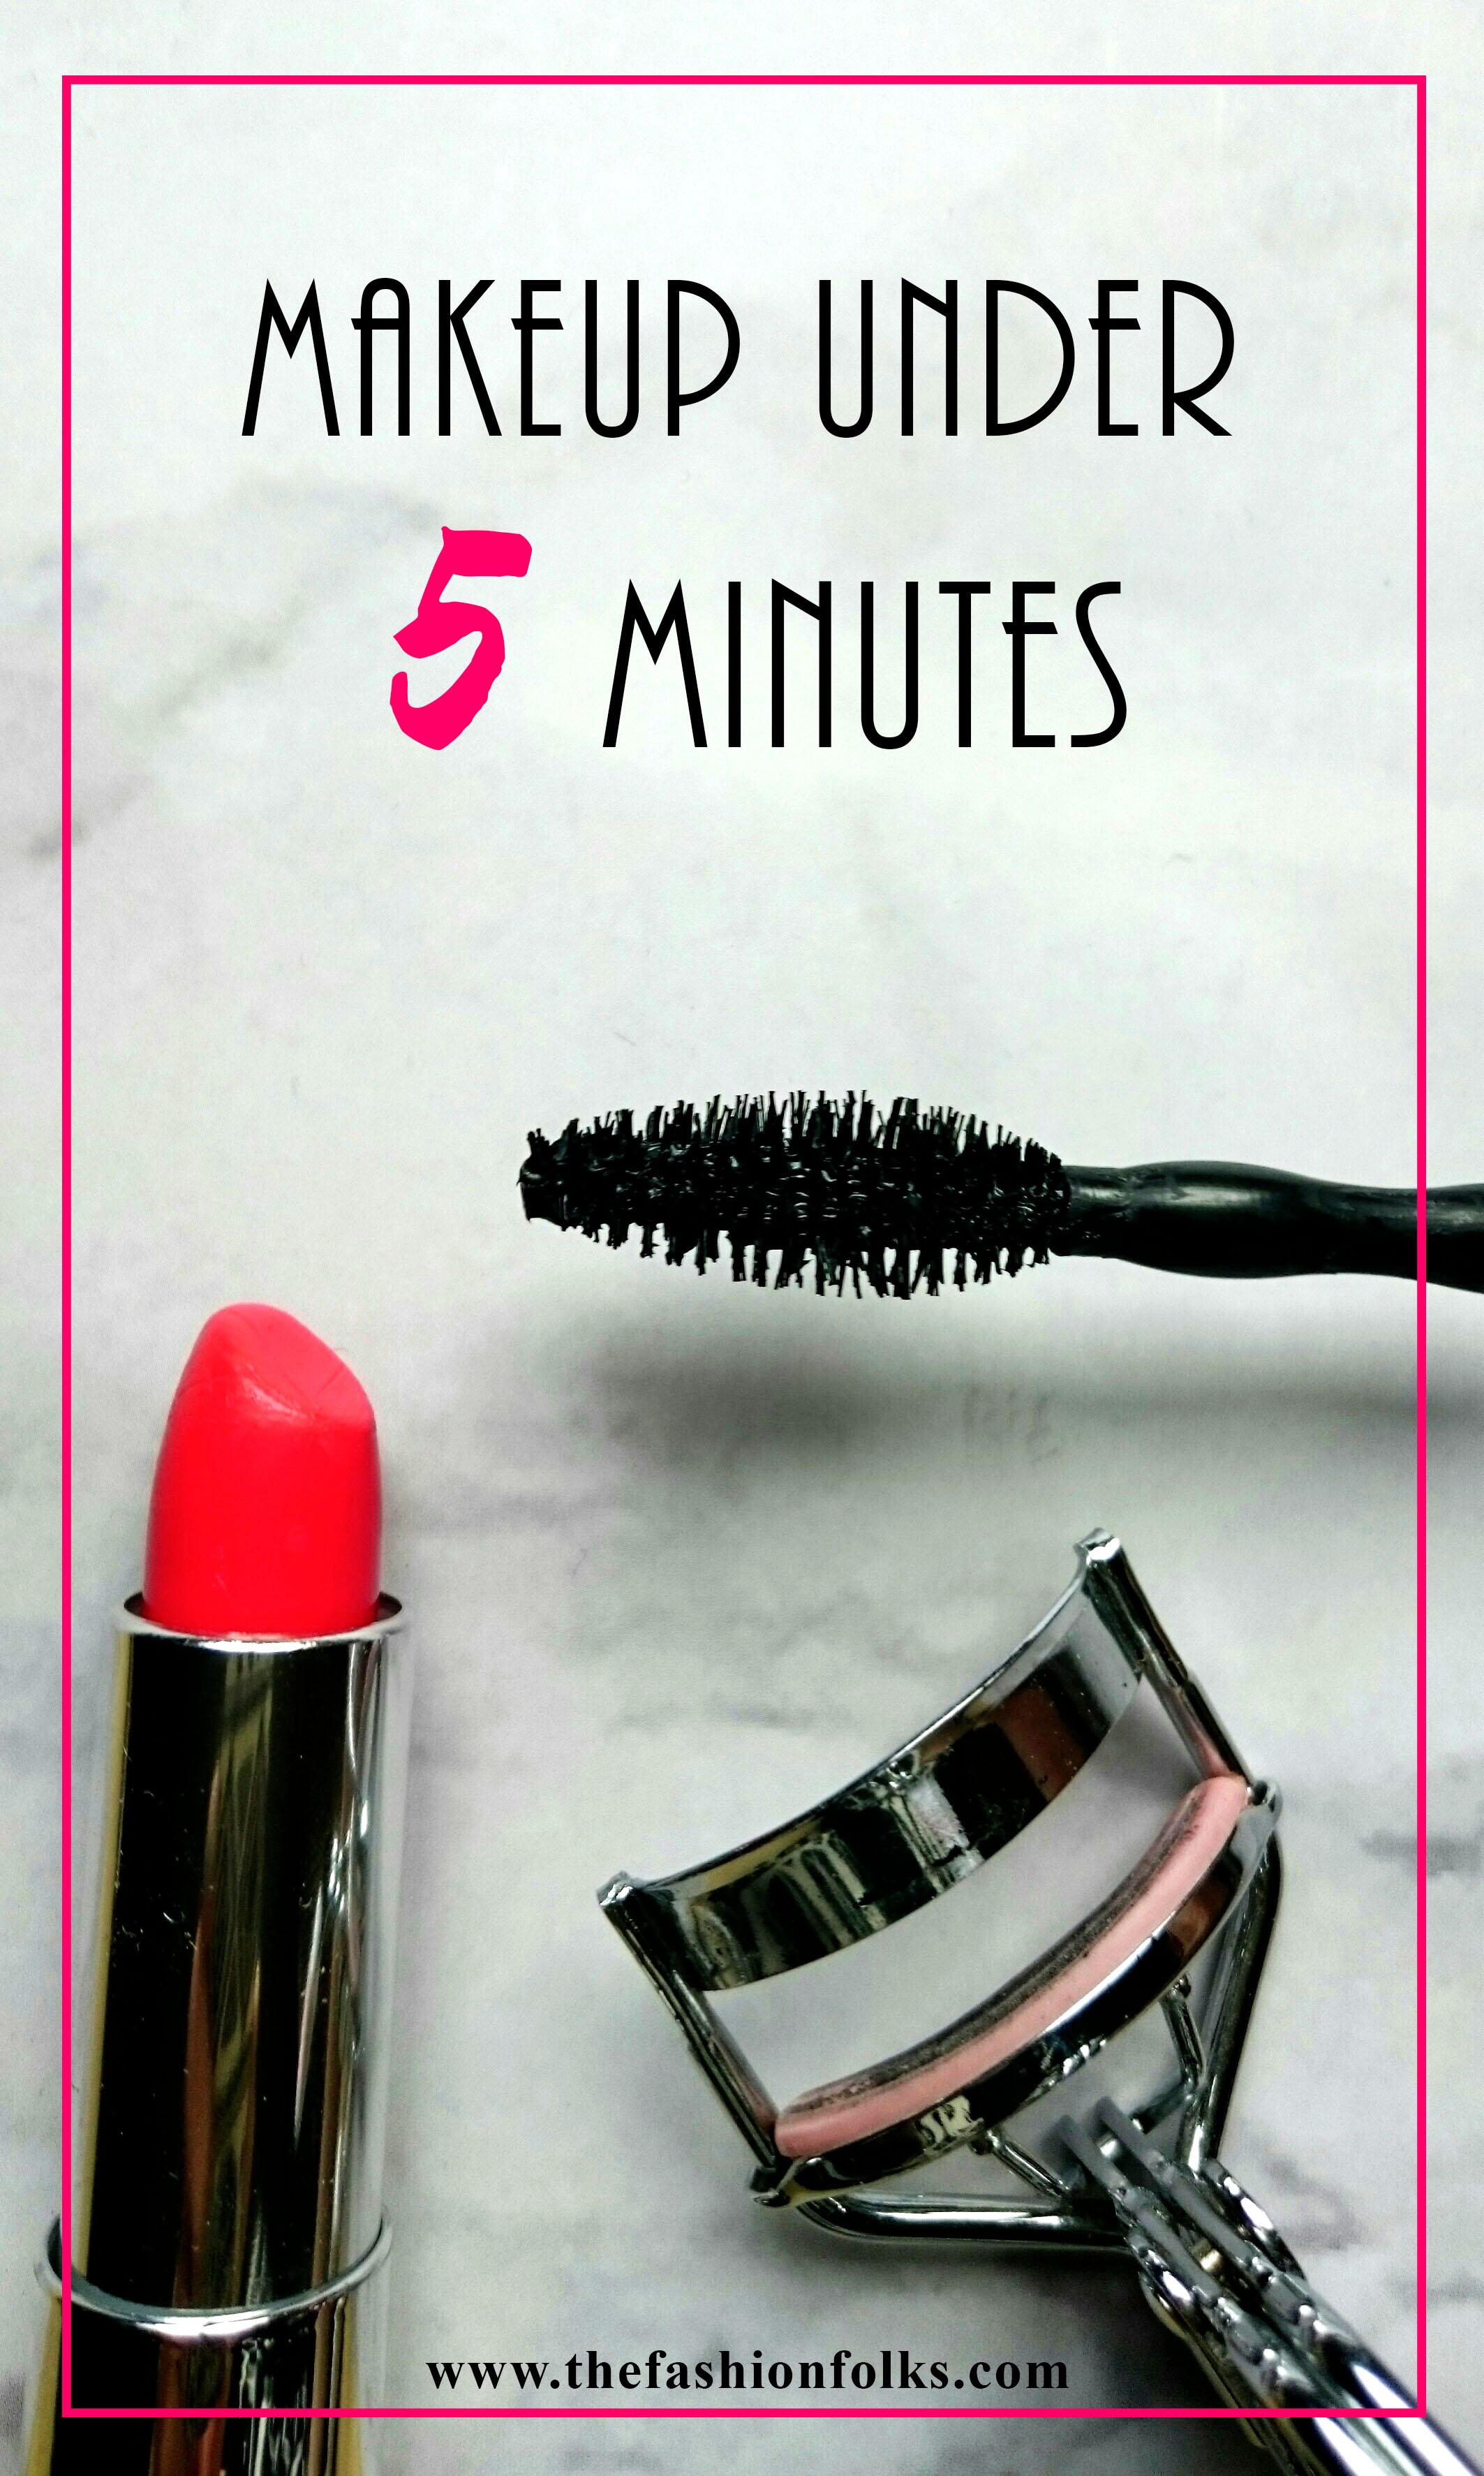 Makeup Under 5 Minutes + Makeup Inspiration | The Fashion Folks